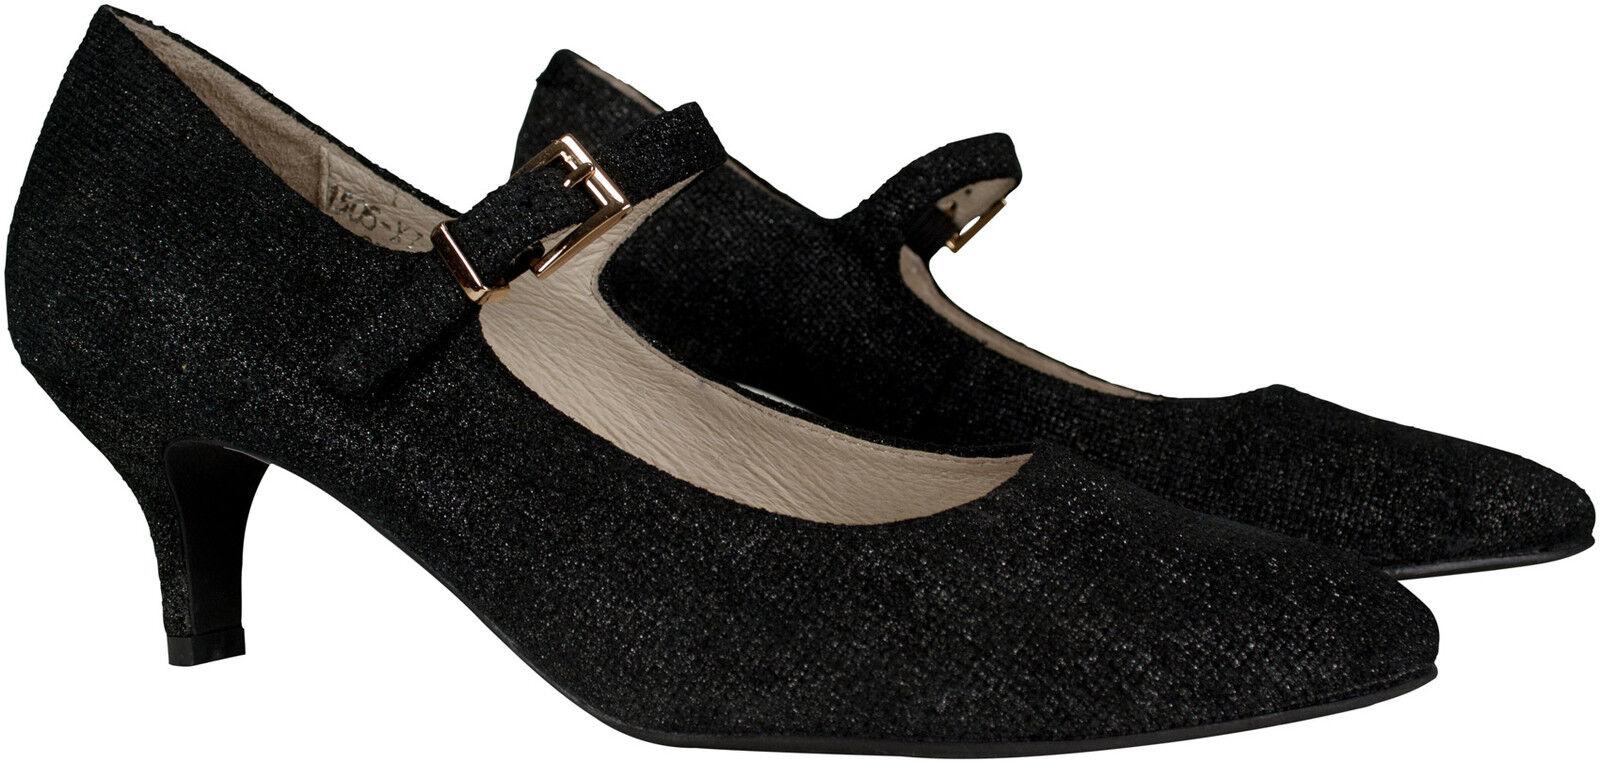 Bride Escarpins Noir Metallic Chèvres Cuir kitten heels collection Raide taille 37